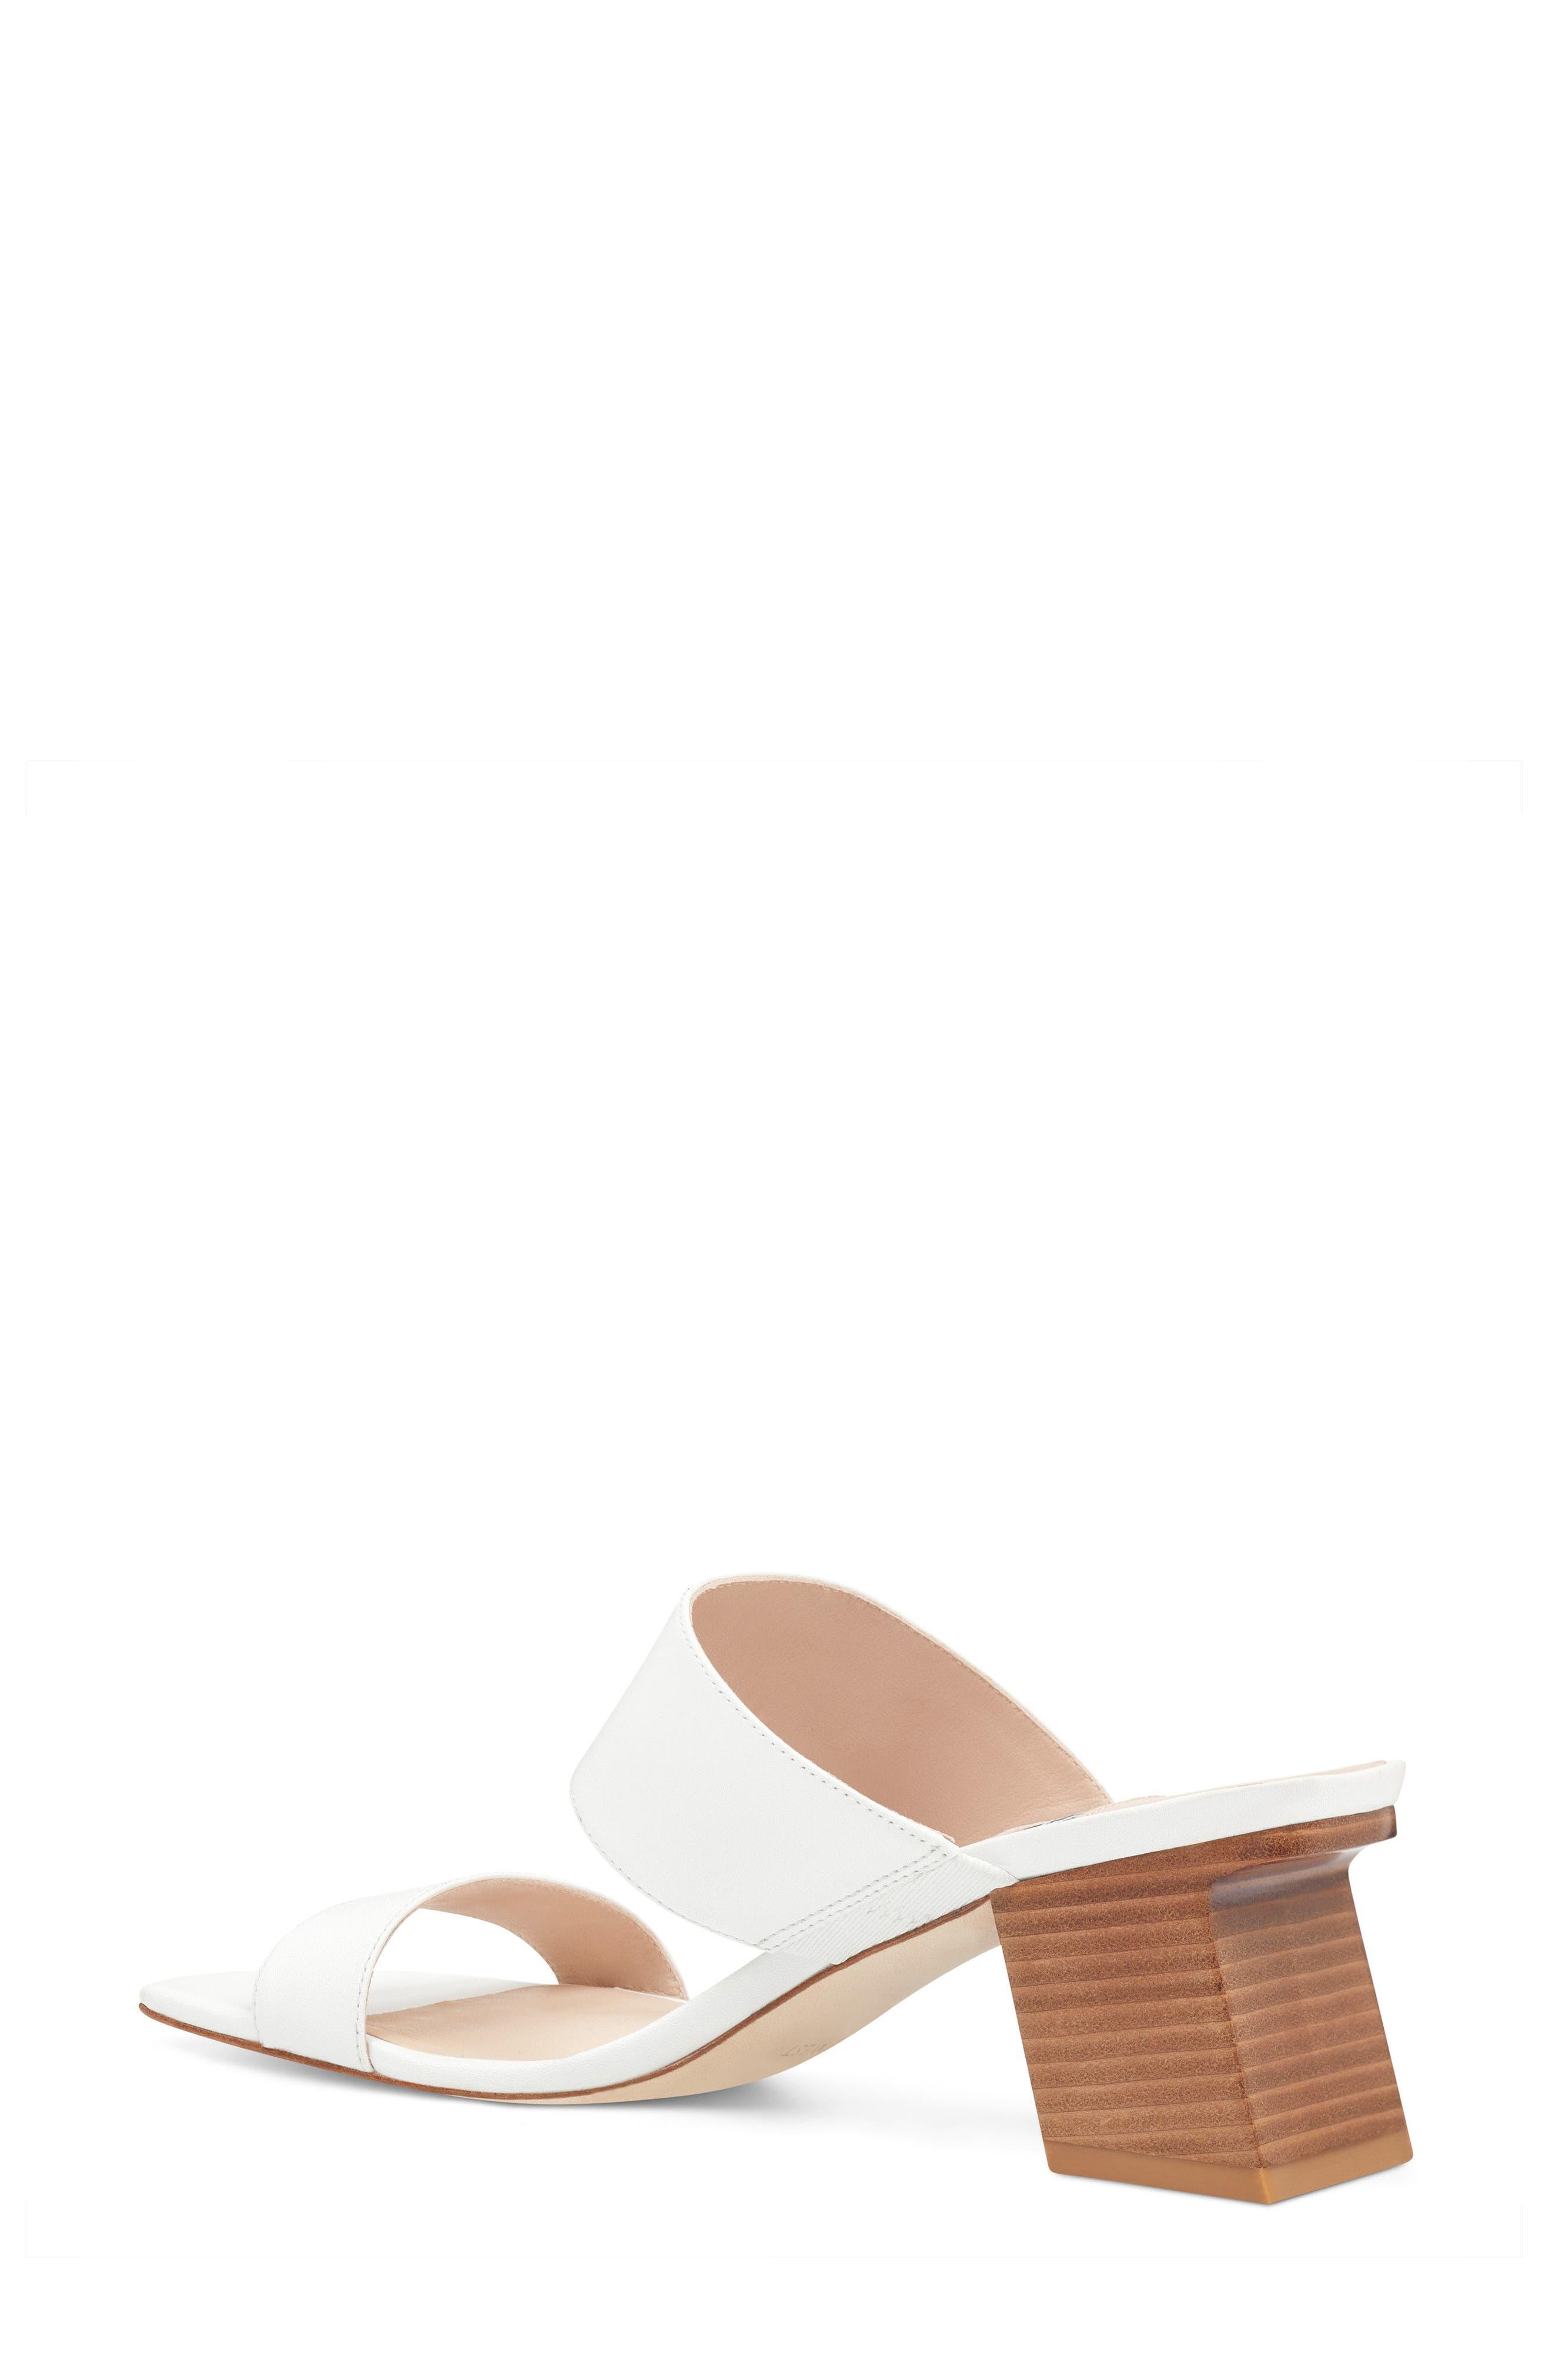 Churen - 40th Anniversary Capsule Collection Sandal,                             Alternate thumbnail 2, color,                             White Leather